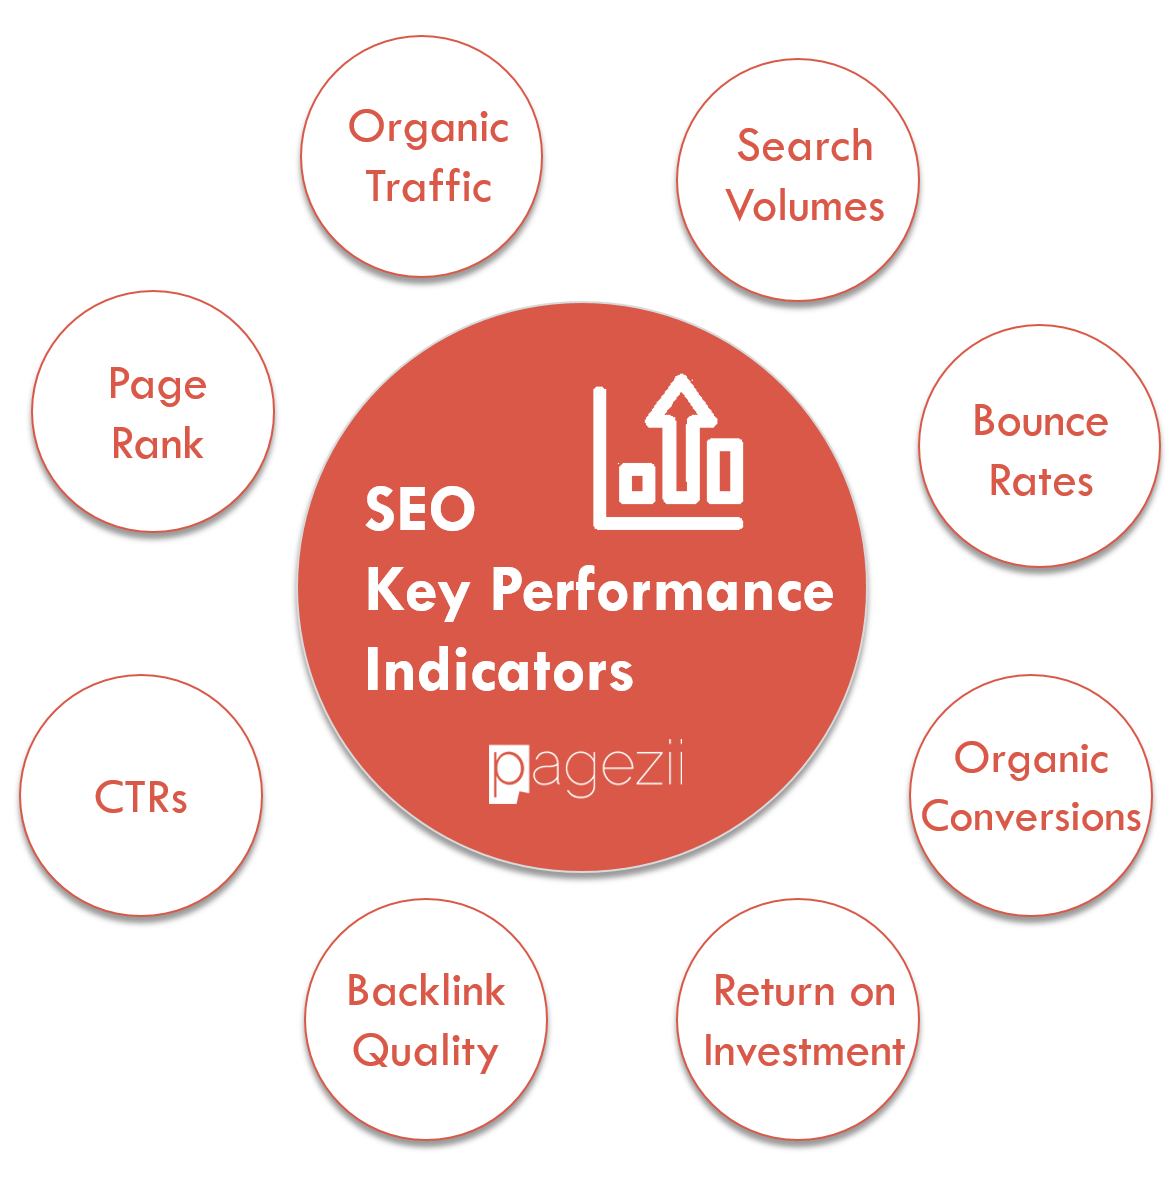 SEO KPIs Pagezii Digital Marketing Blog